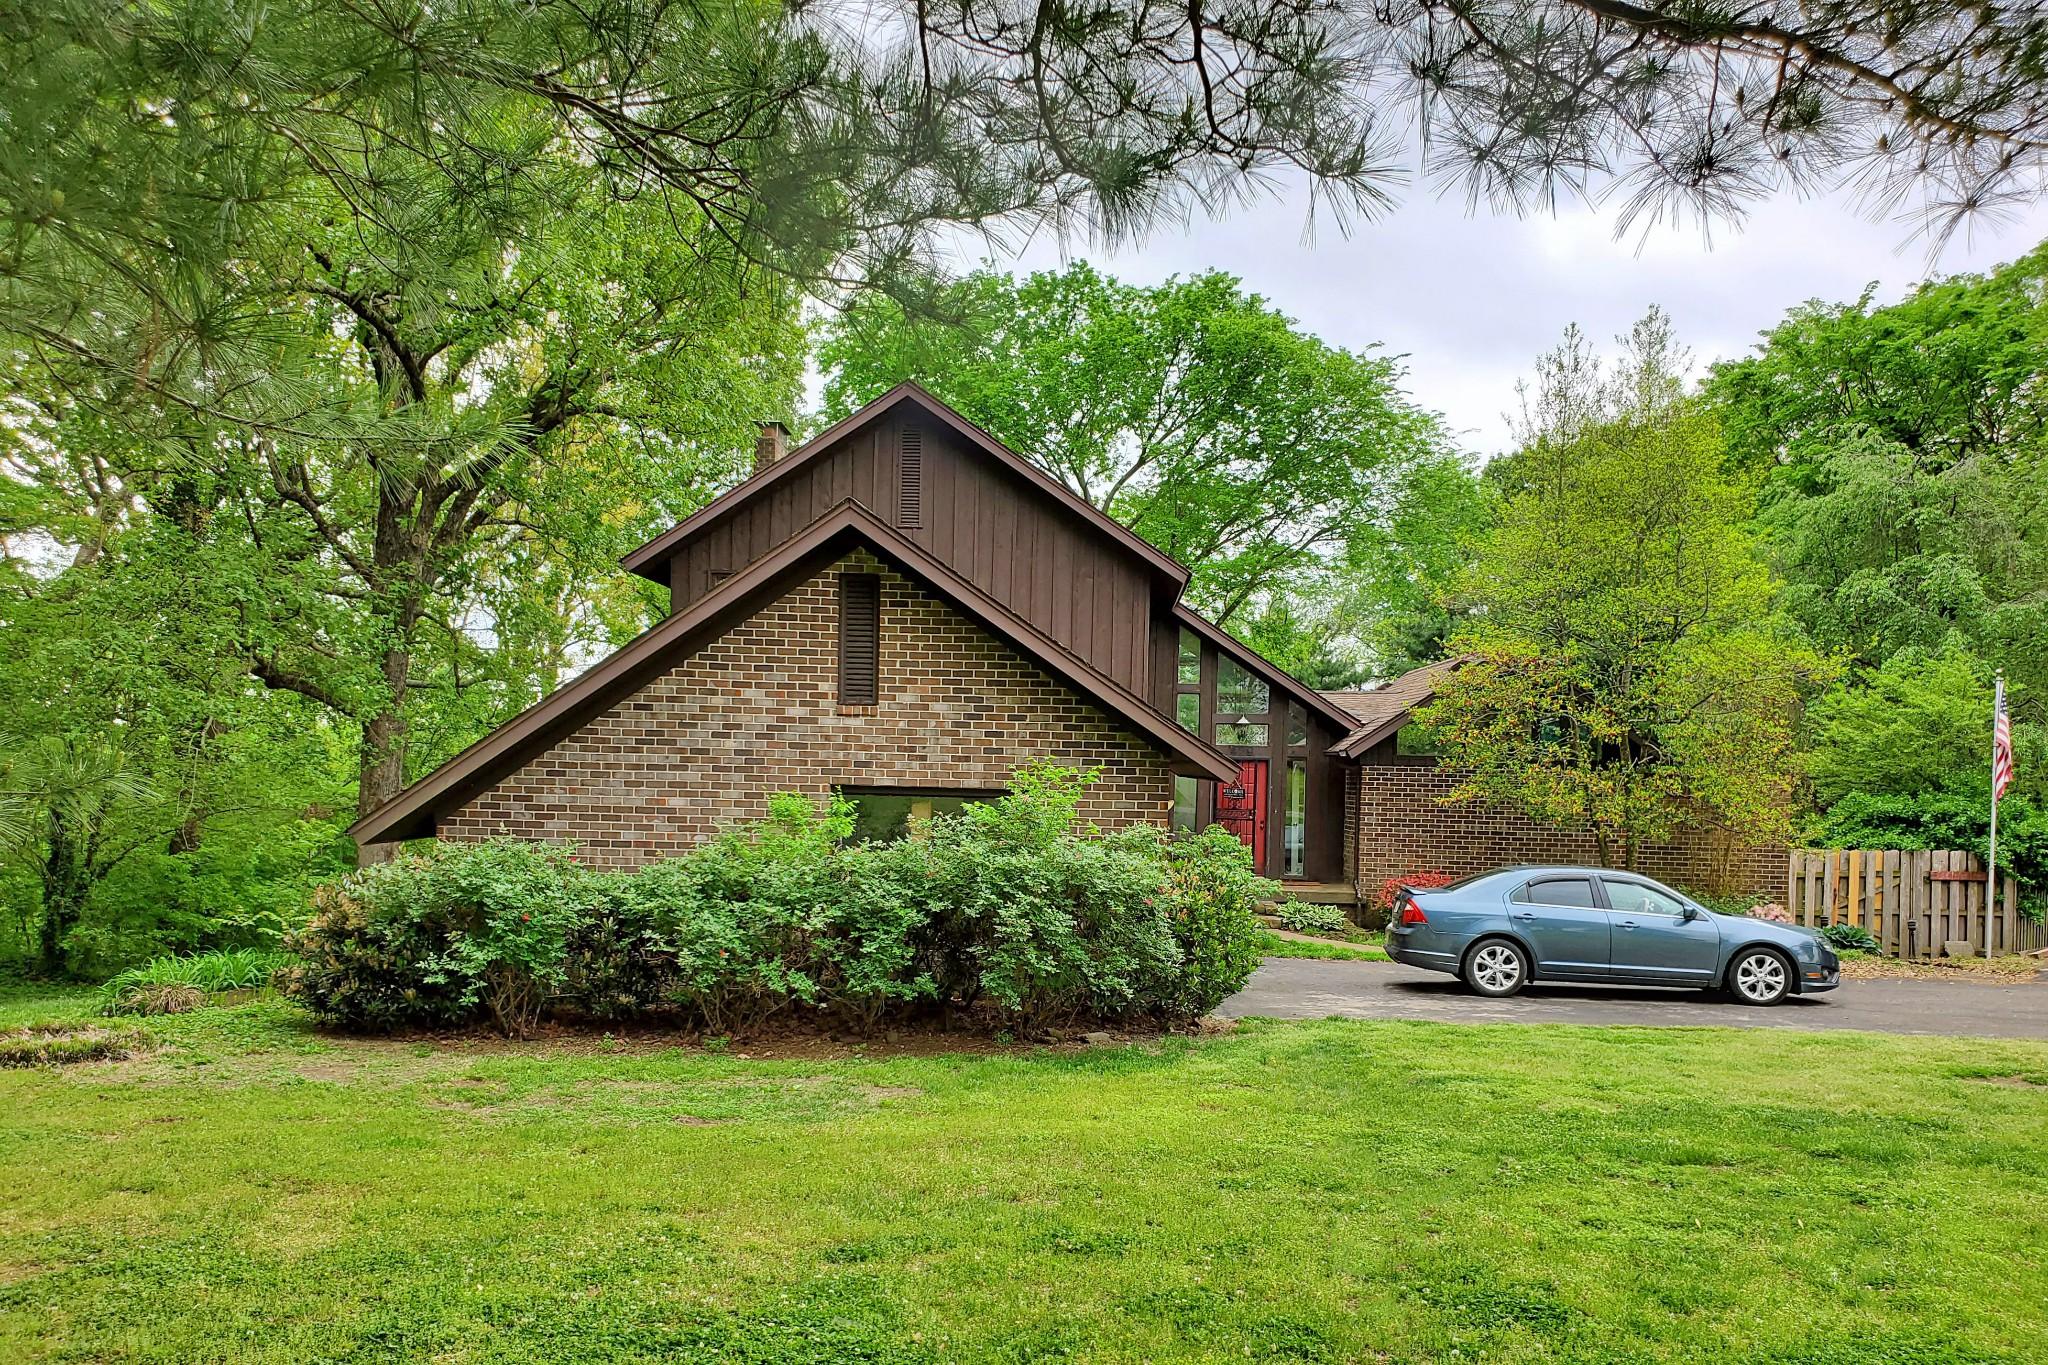 429 Widener Cir Property Photo - Franklin, KY real estate listing